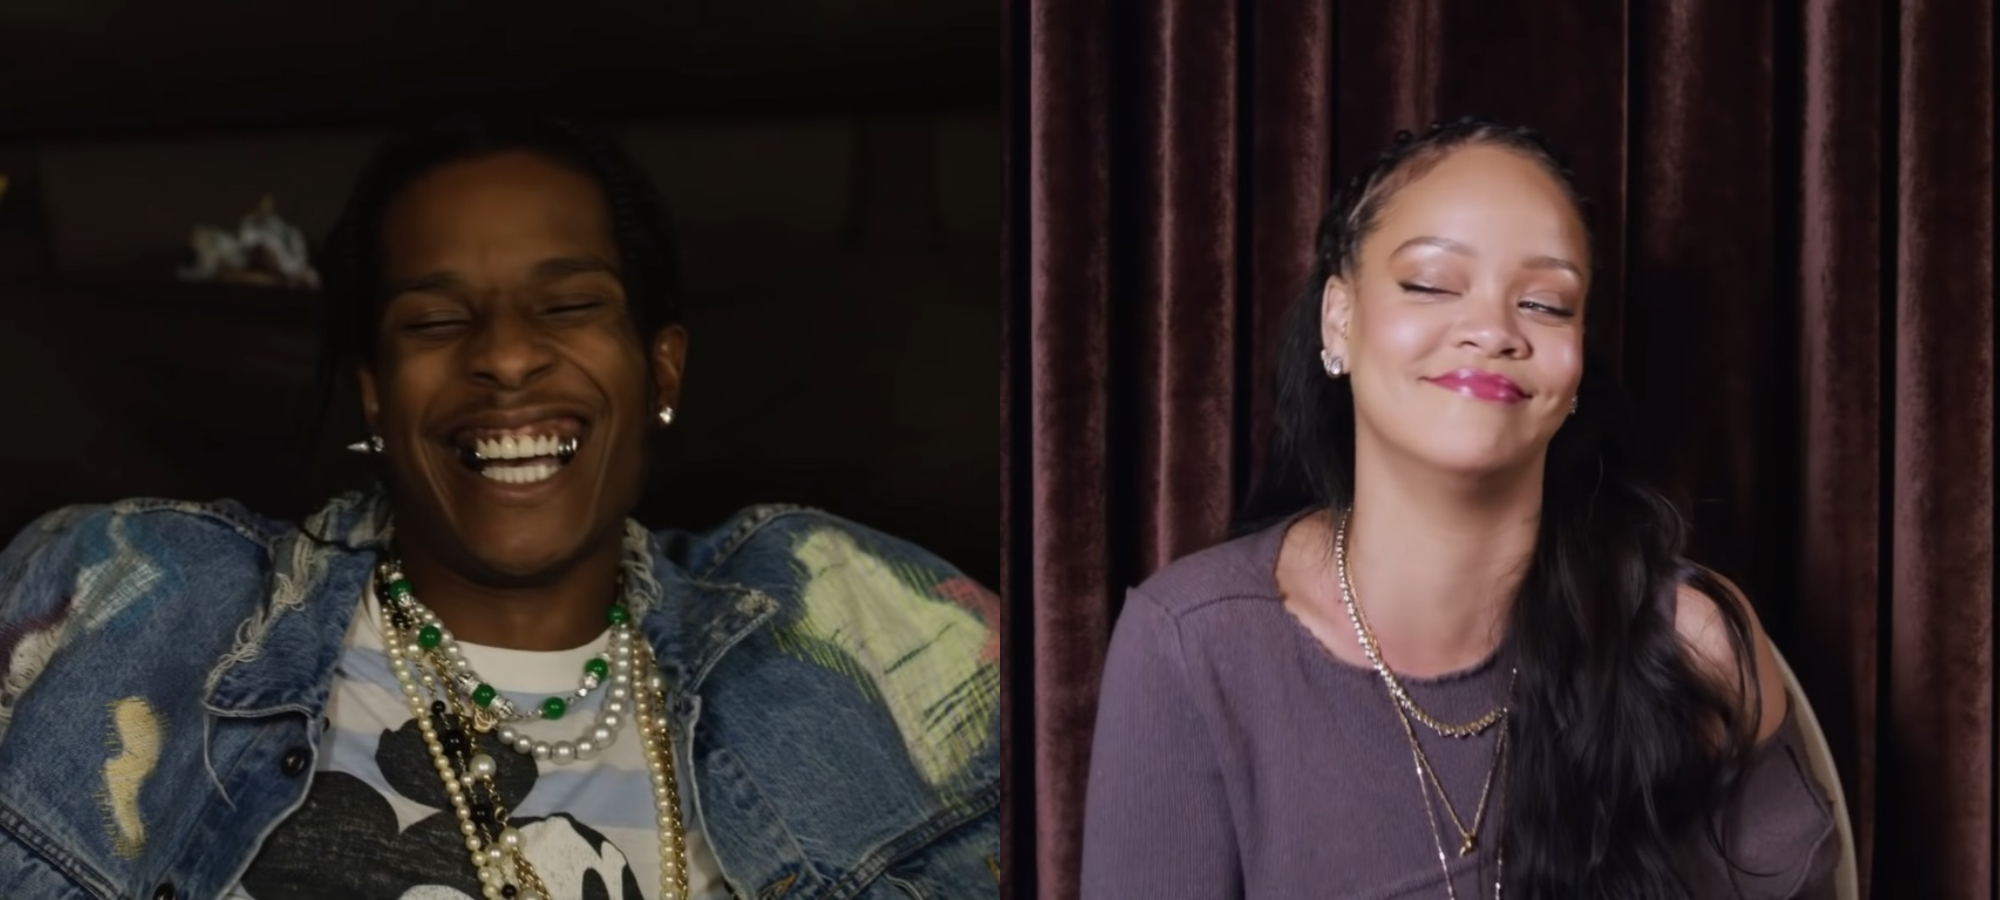 Así fue la divertida entrevista de A$AP Rocky a Rihanna